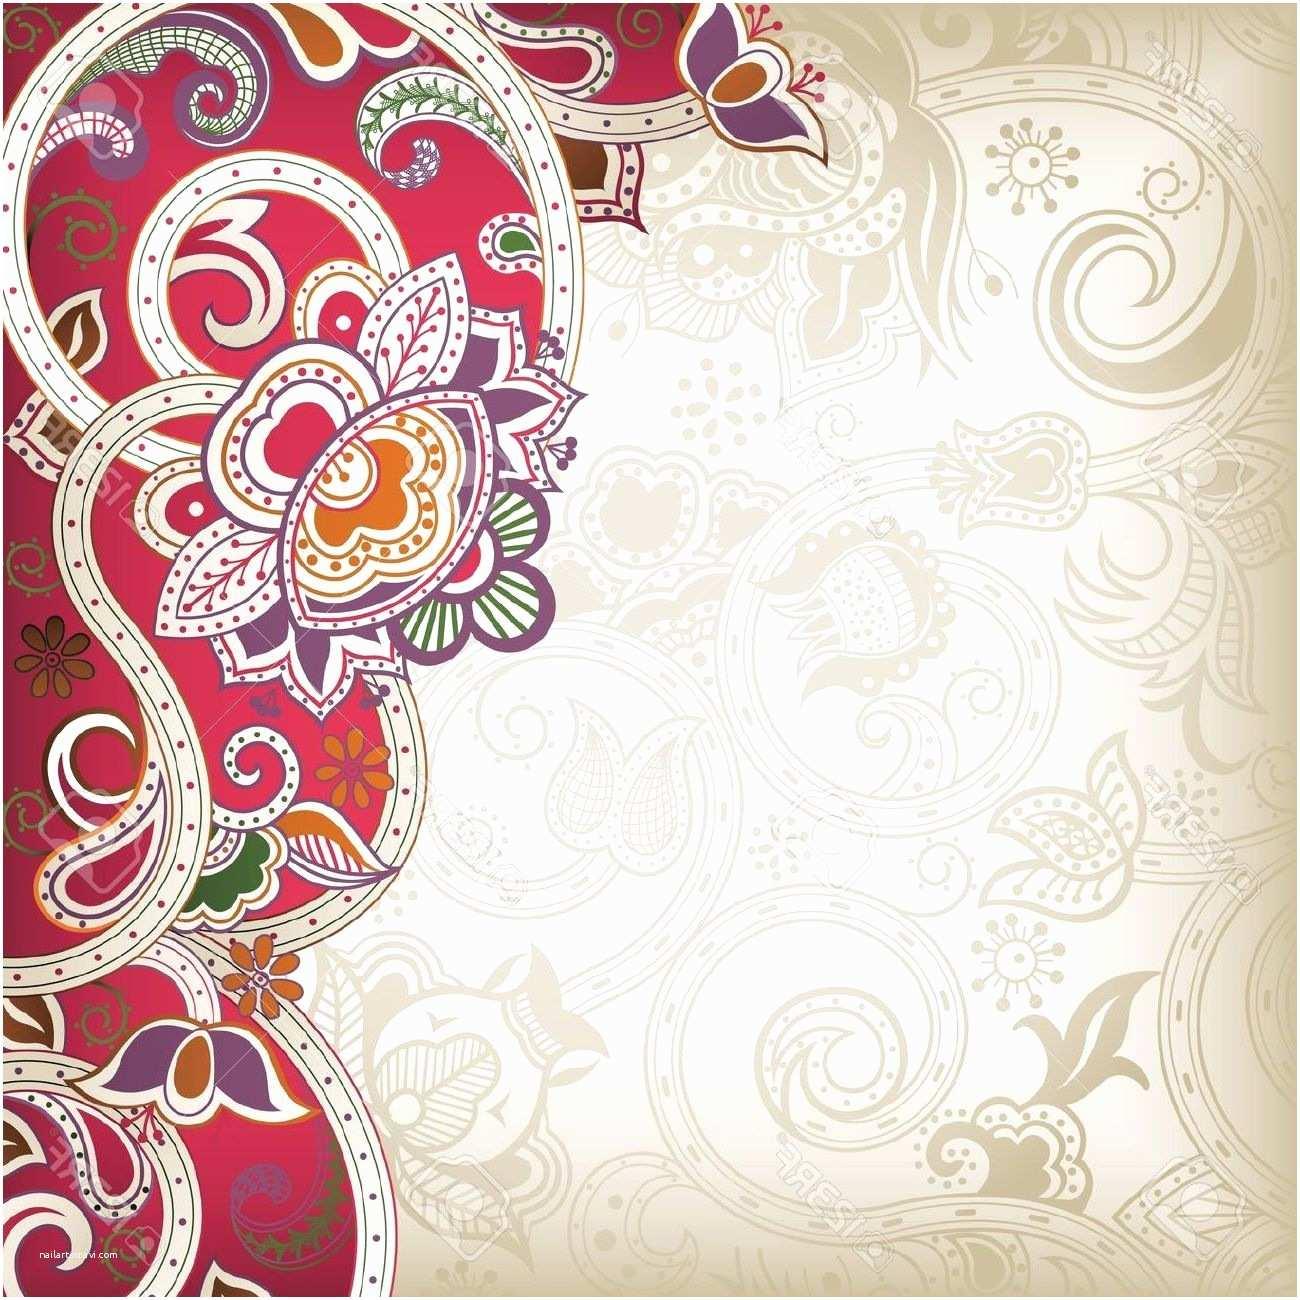 Wedding Invitation Design Images 7 Good Indian Wedding Invitation Background Designs Free